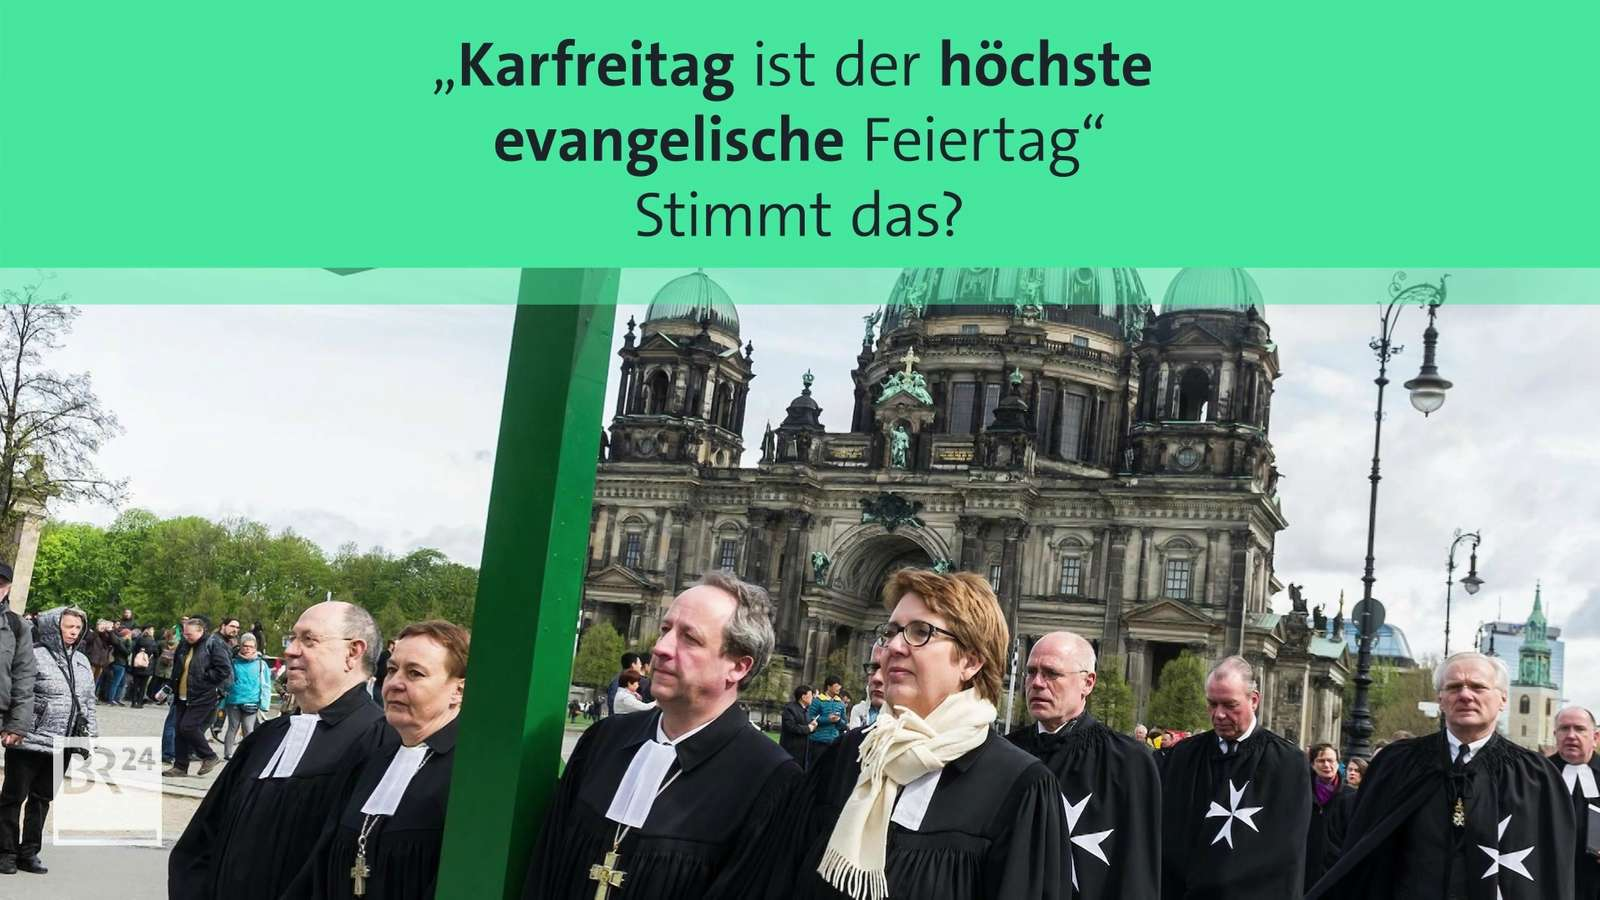 Karfreitag Feiertag Bayern